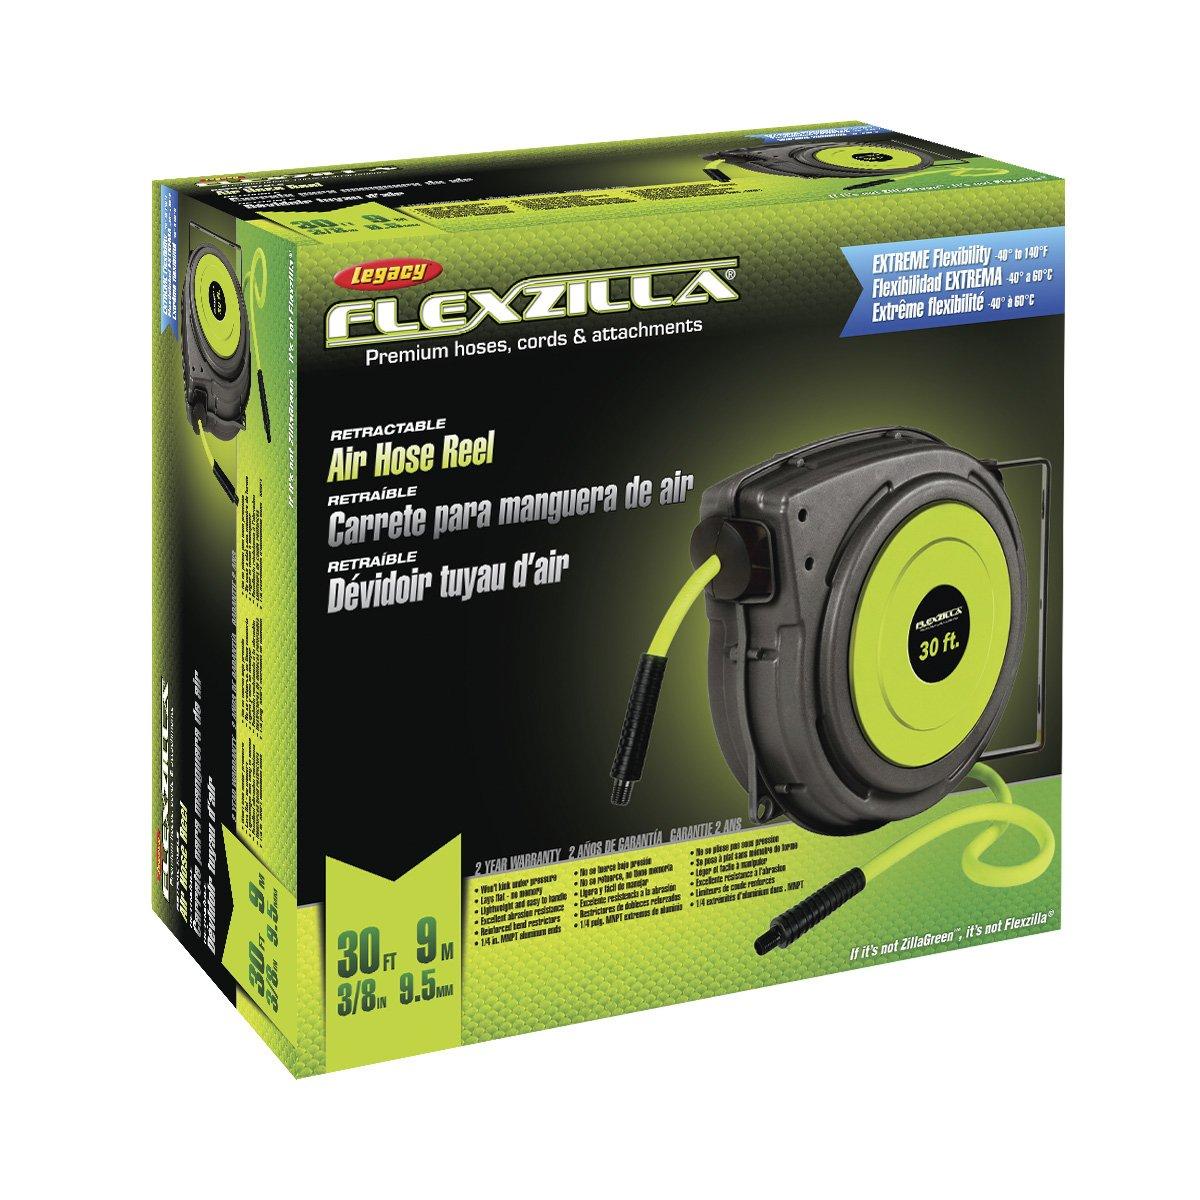 Flexzilla Retractable Enclosed Plastic Air Hose Reel, 3/8 in. x 30 ft., Heavy Duty, Lightweight, Hybrid, ZillaGreen - L8230FZ